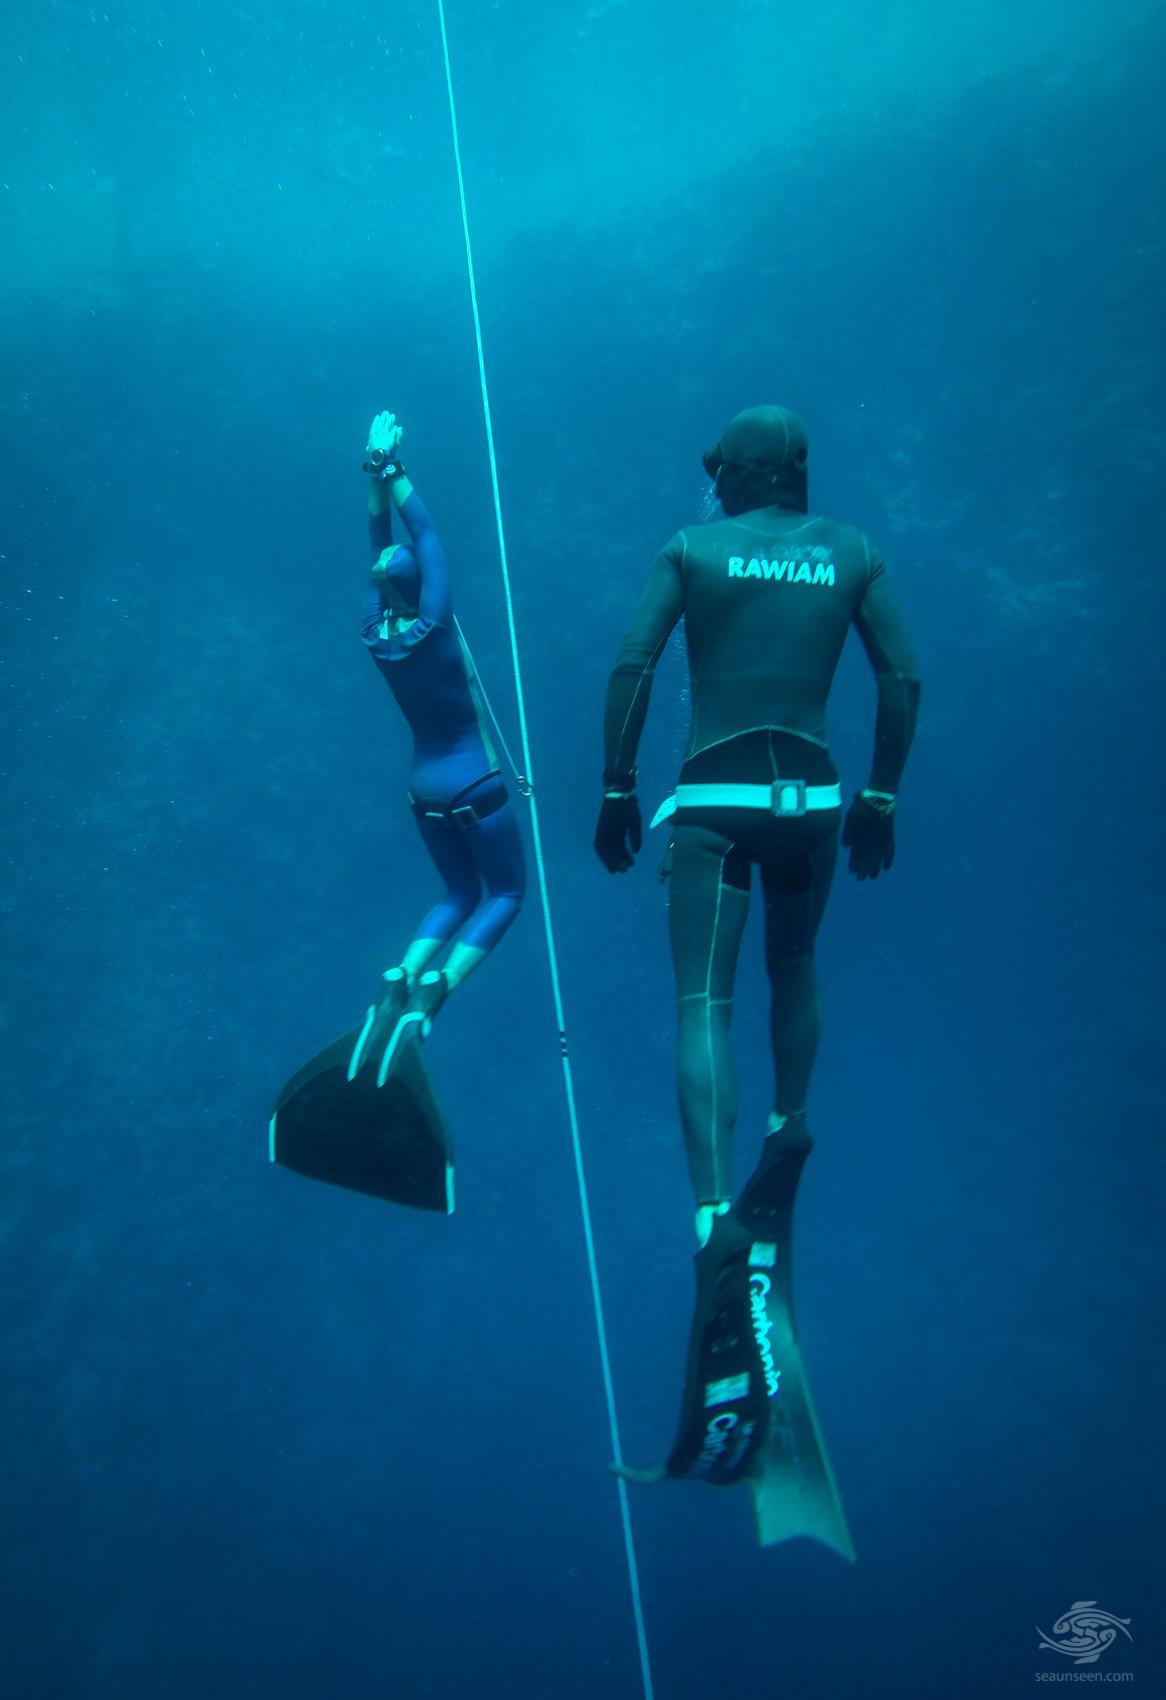 Sahika Ercumen freediving in blue hole in Dahab